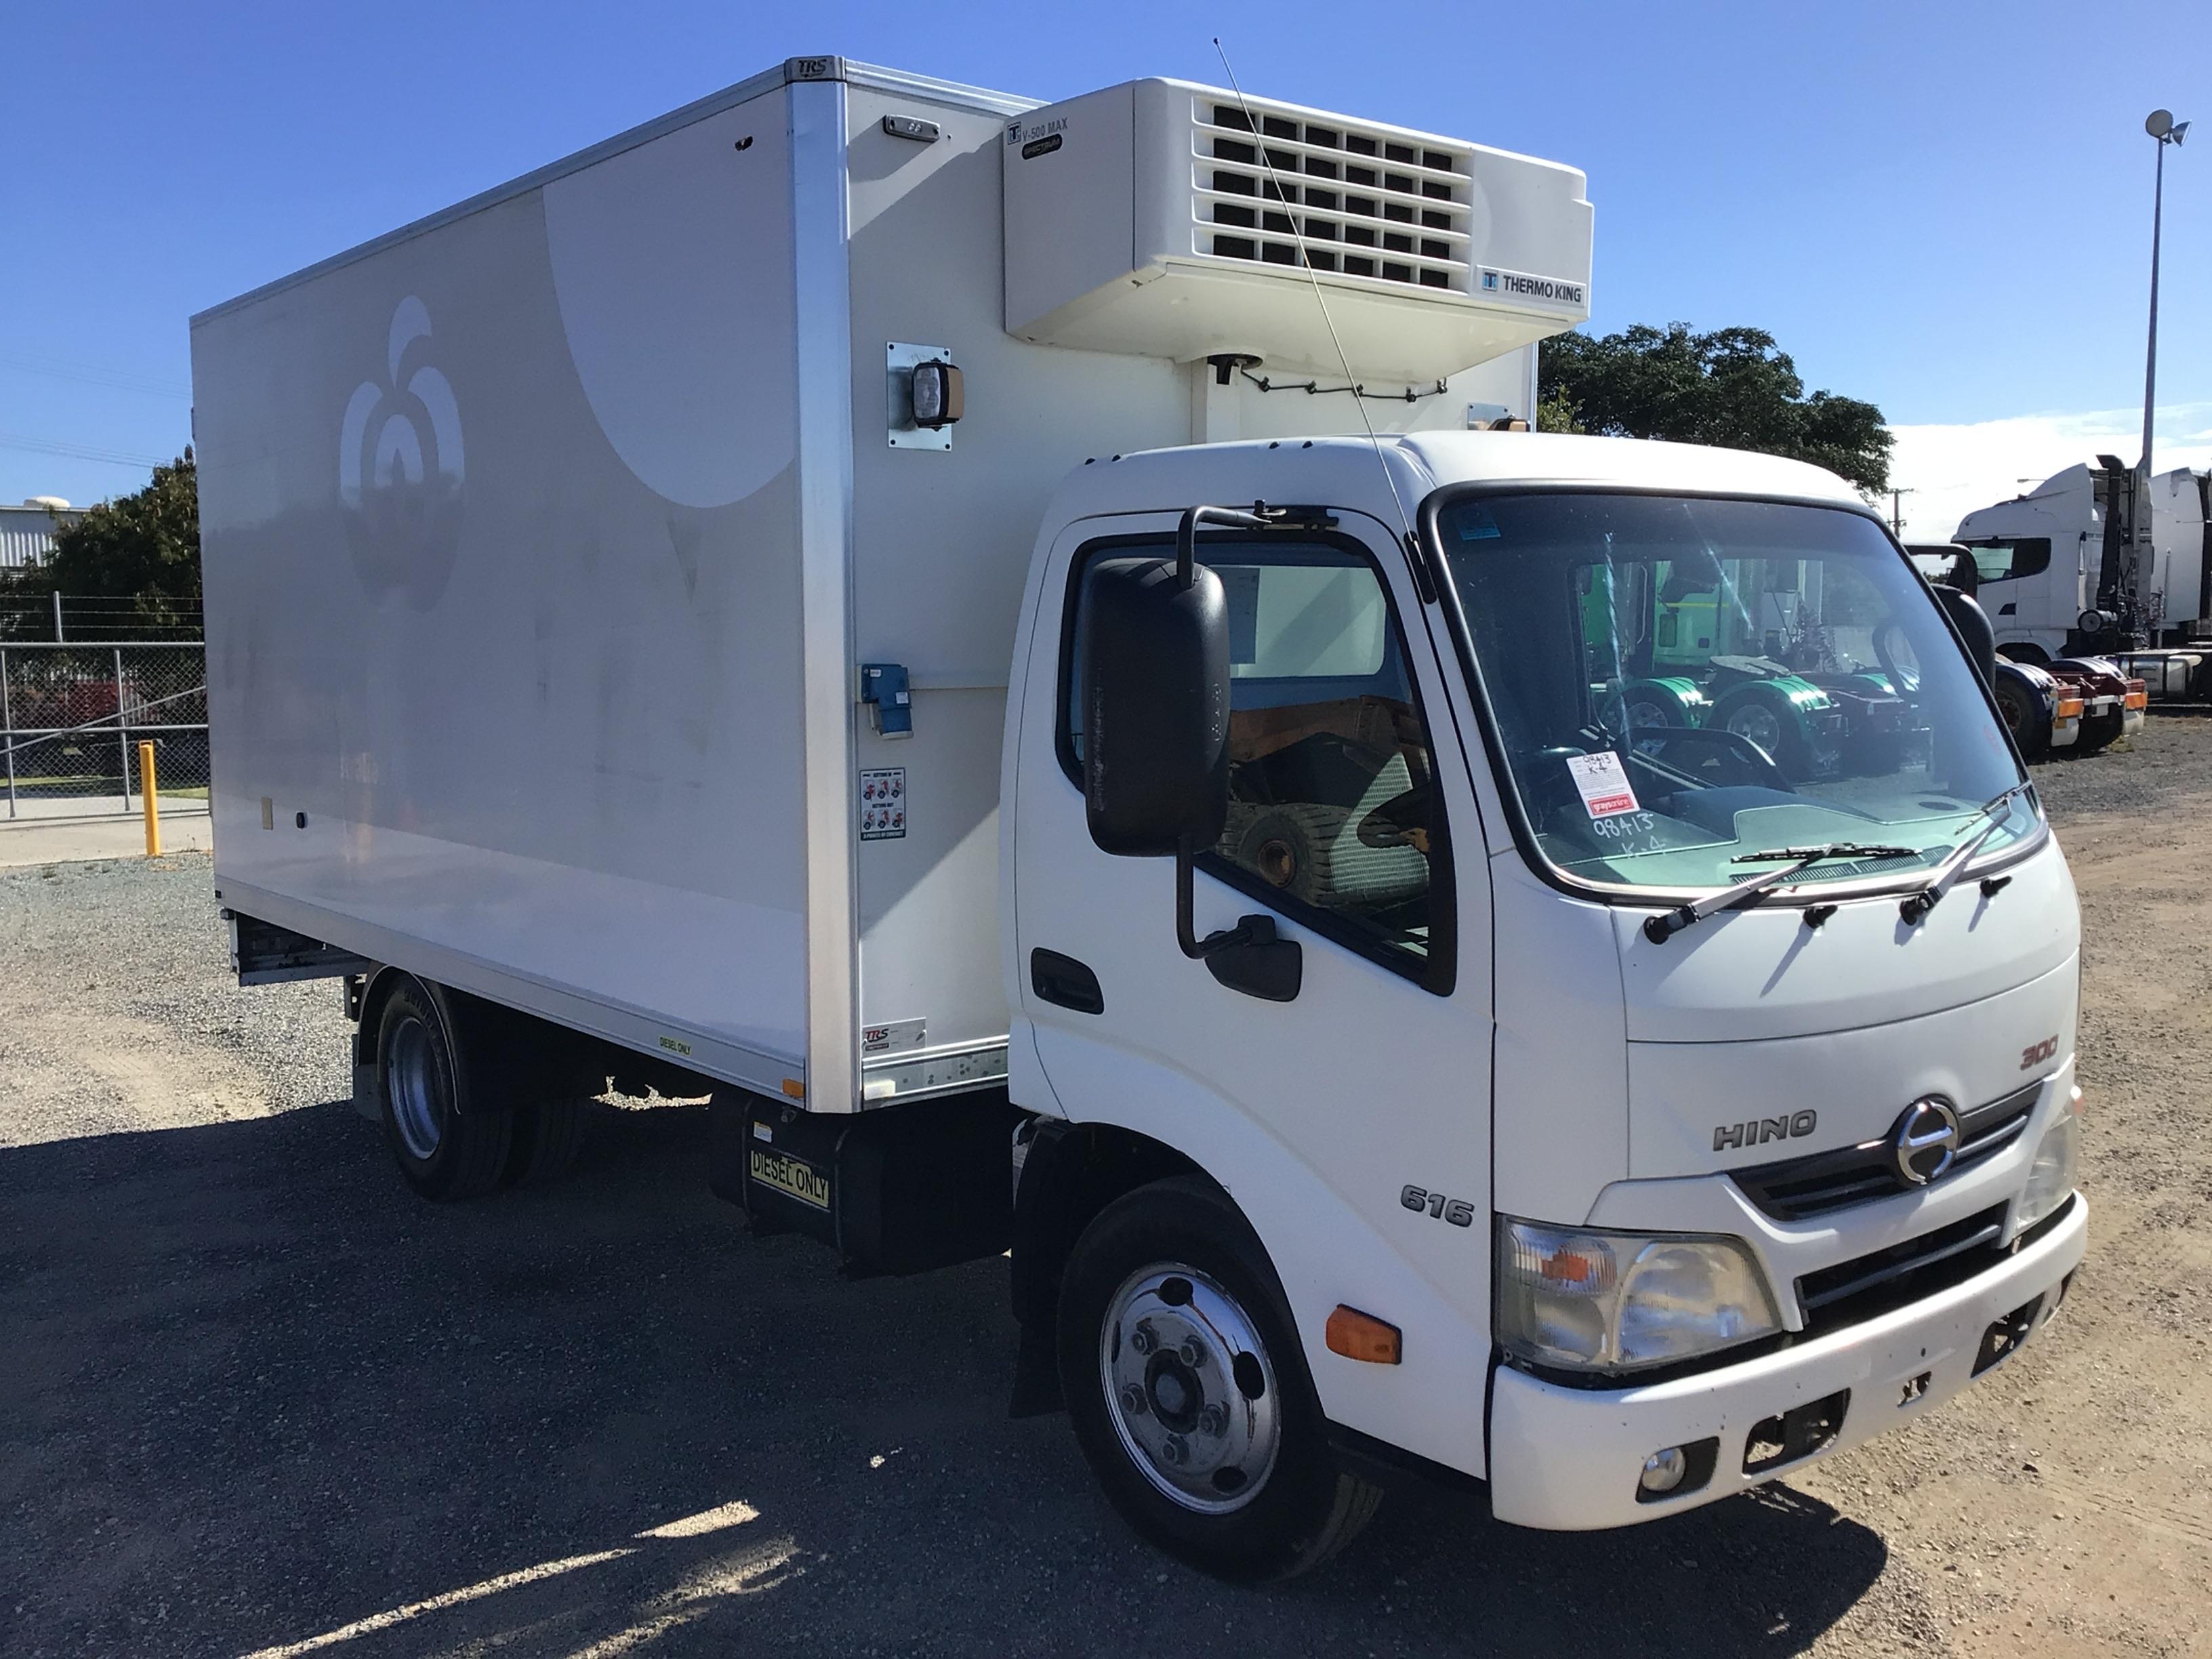 2014 Hino 300 Series 2 Refrigerated Body Truck (Ex Fleet)